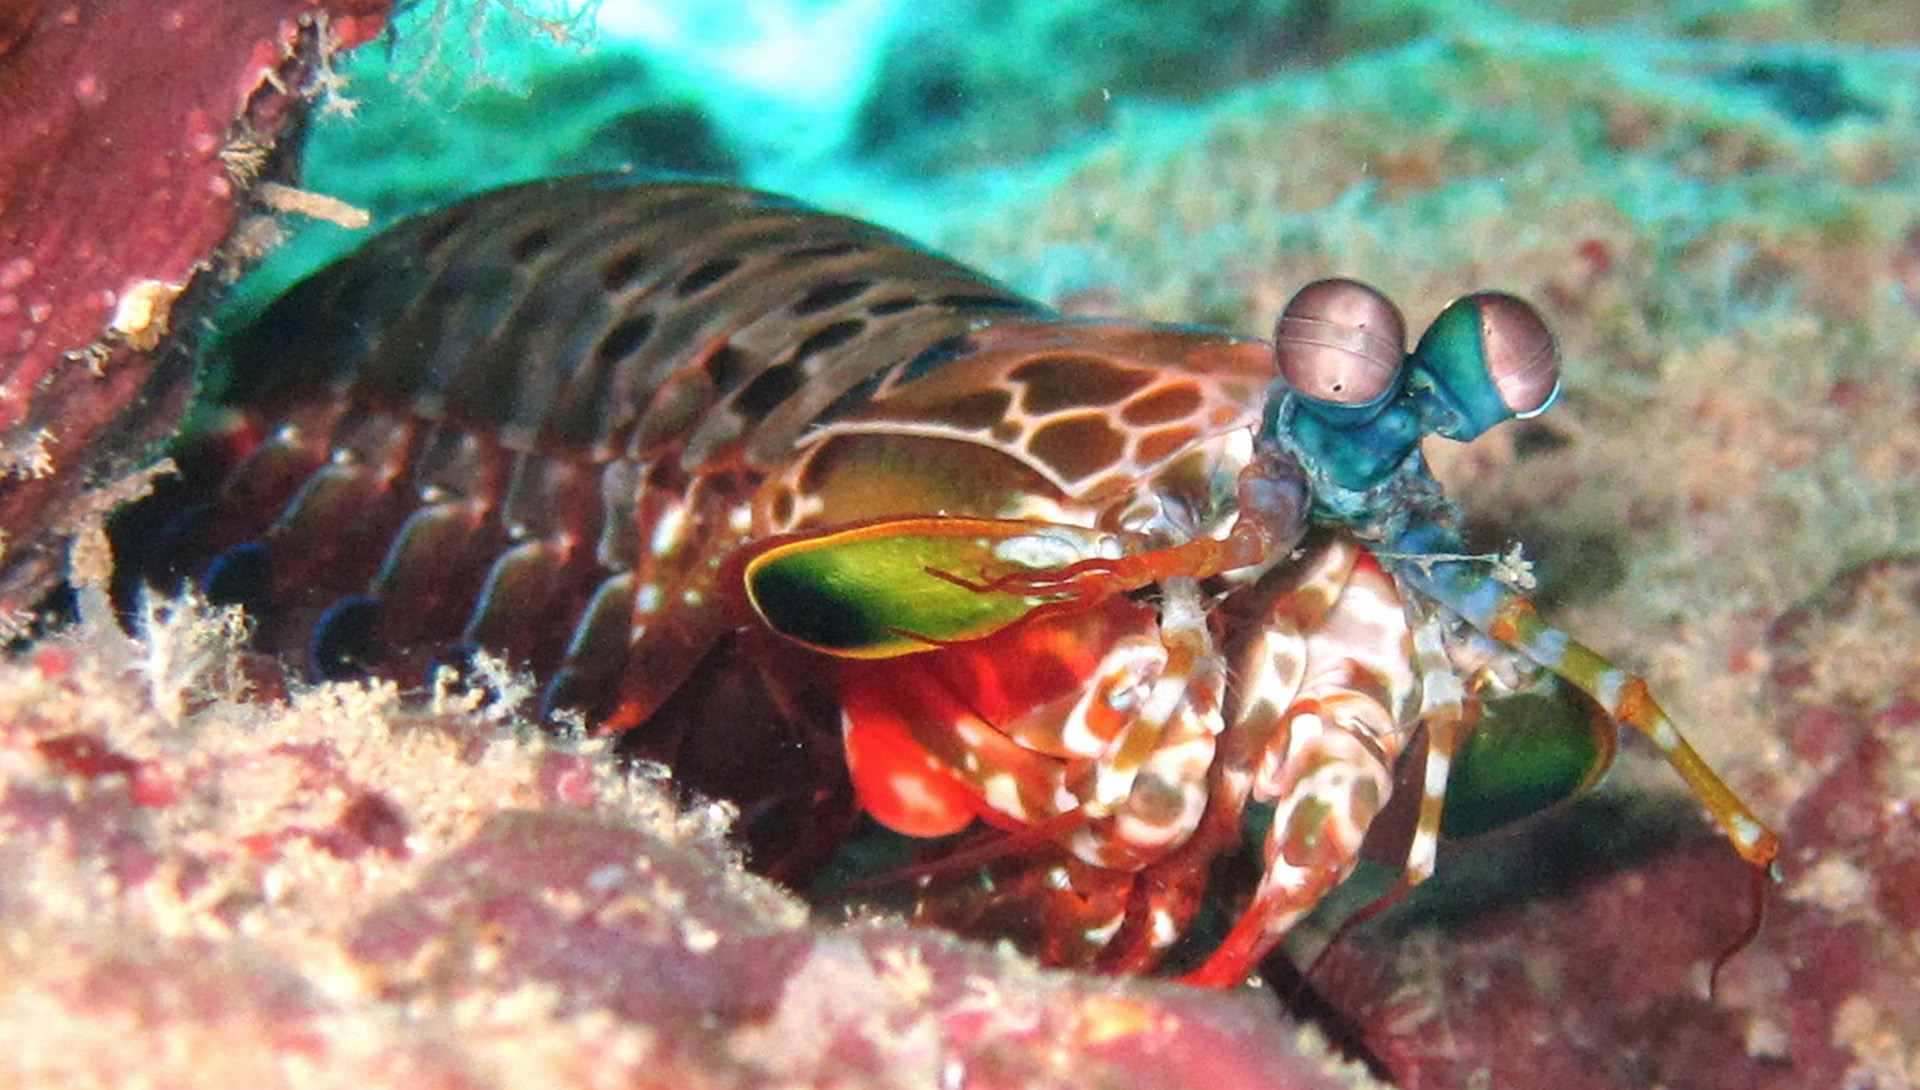 Mantis shrimp, a truly amazing creature